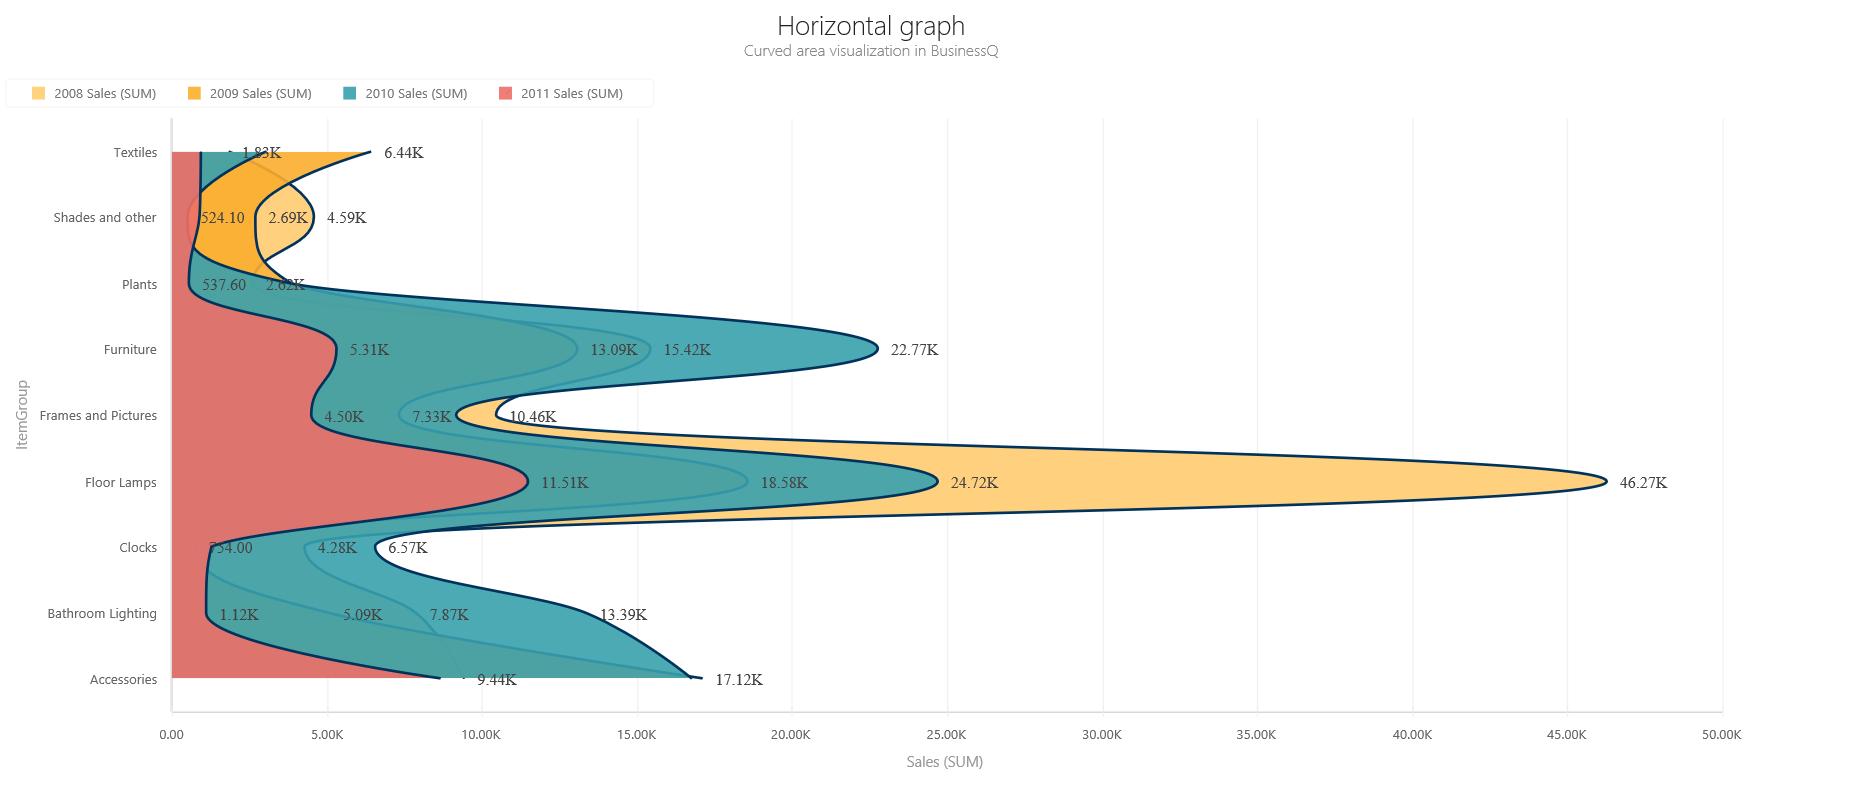 BQ_Horizontal_graph_1_Horizontal_Curved_Area